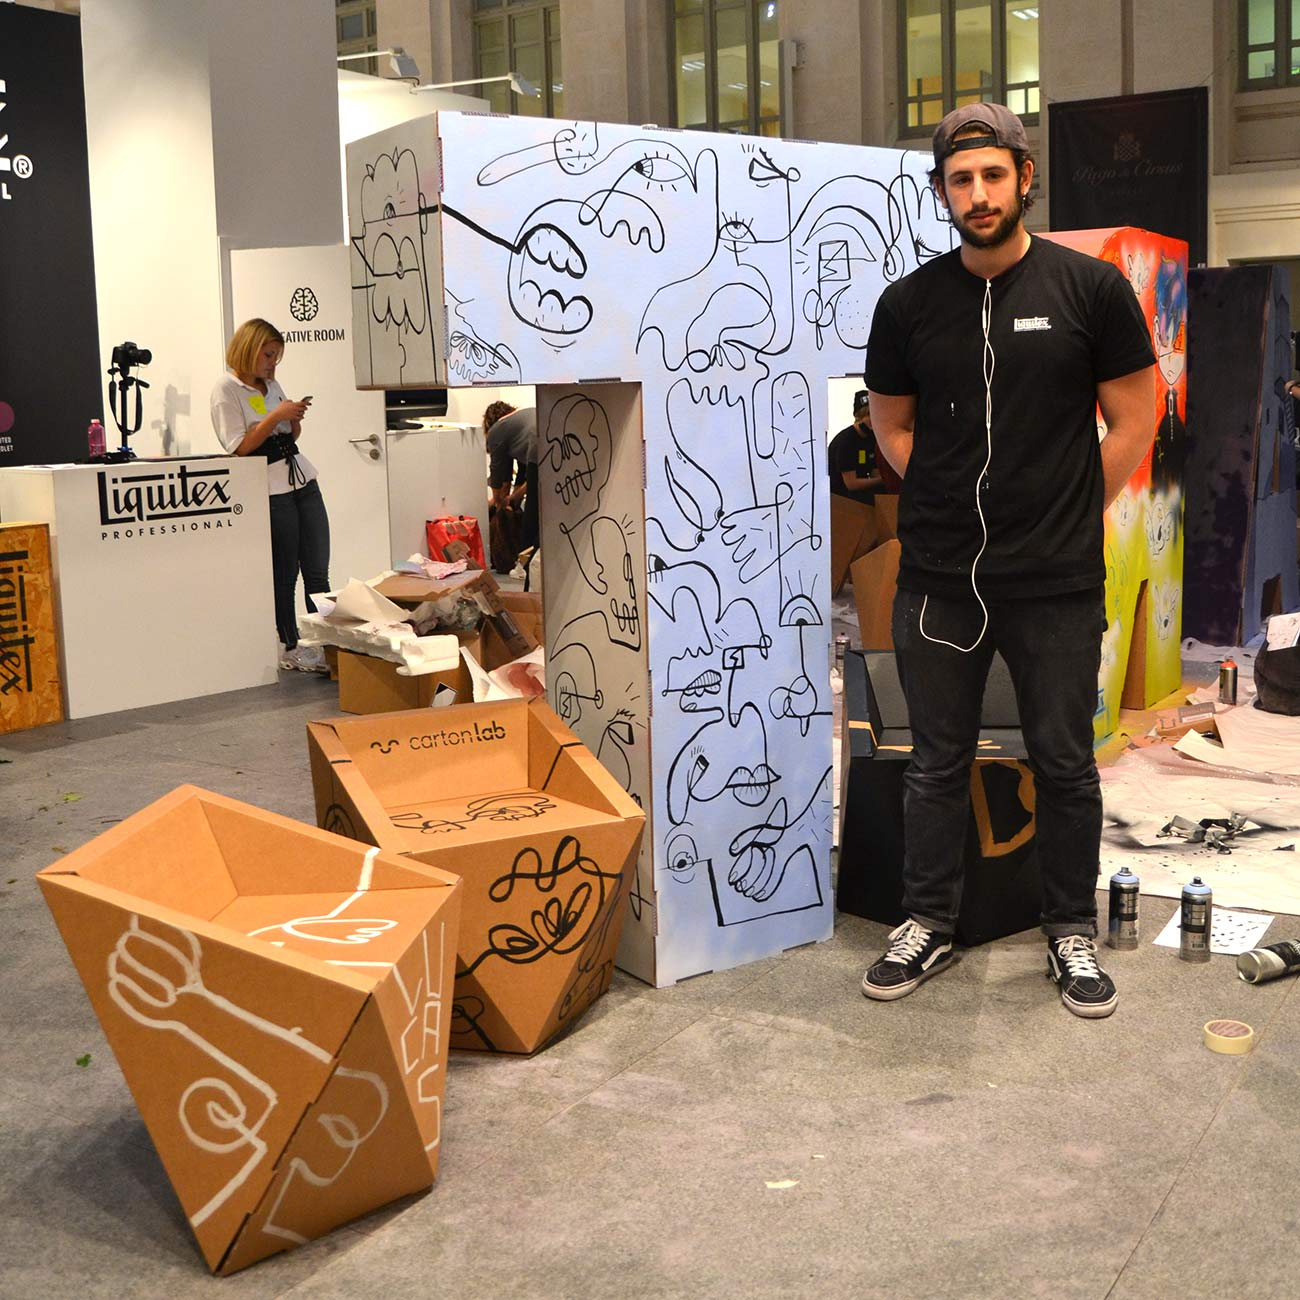 art madrid feria arte letras mobiliario carton corporeos gigantes ied madrid 7